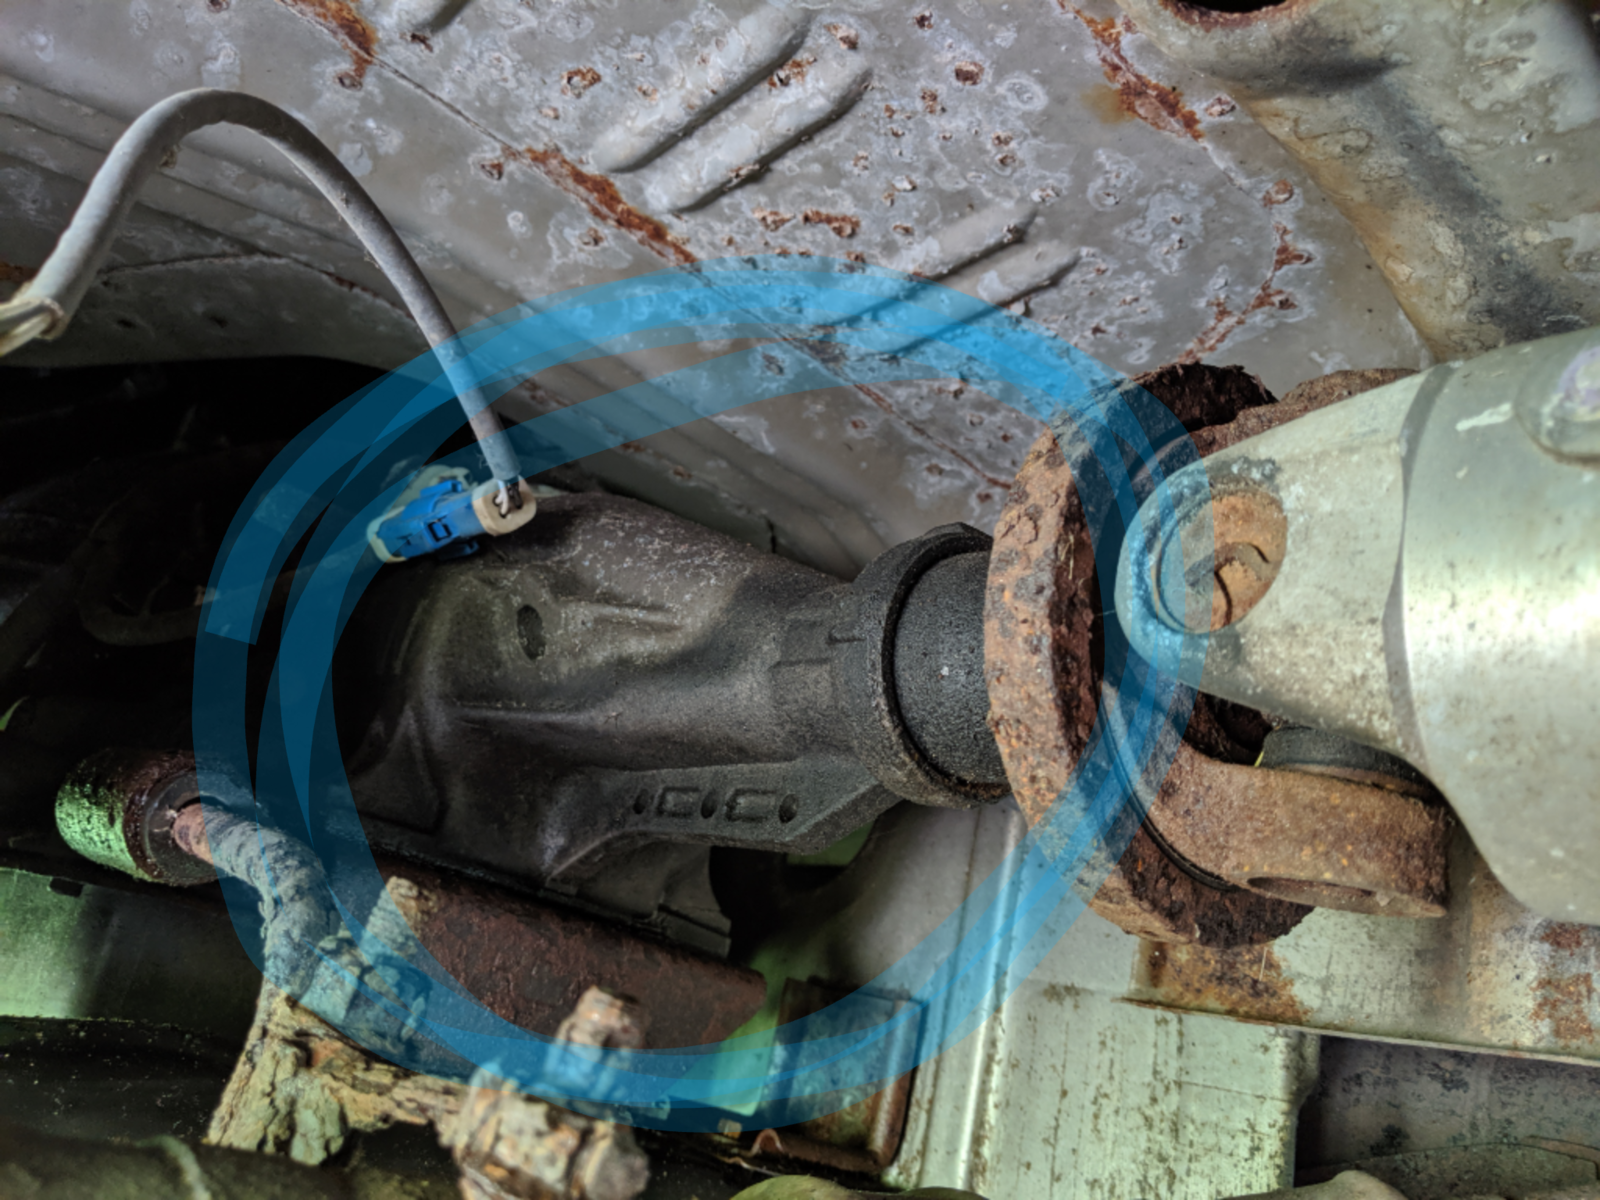 Transmission Fluid Leak >> Ford E Series Cargo Questions Transmission Fluid Leak Cargurus